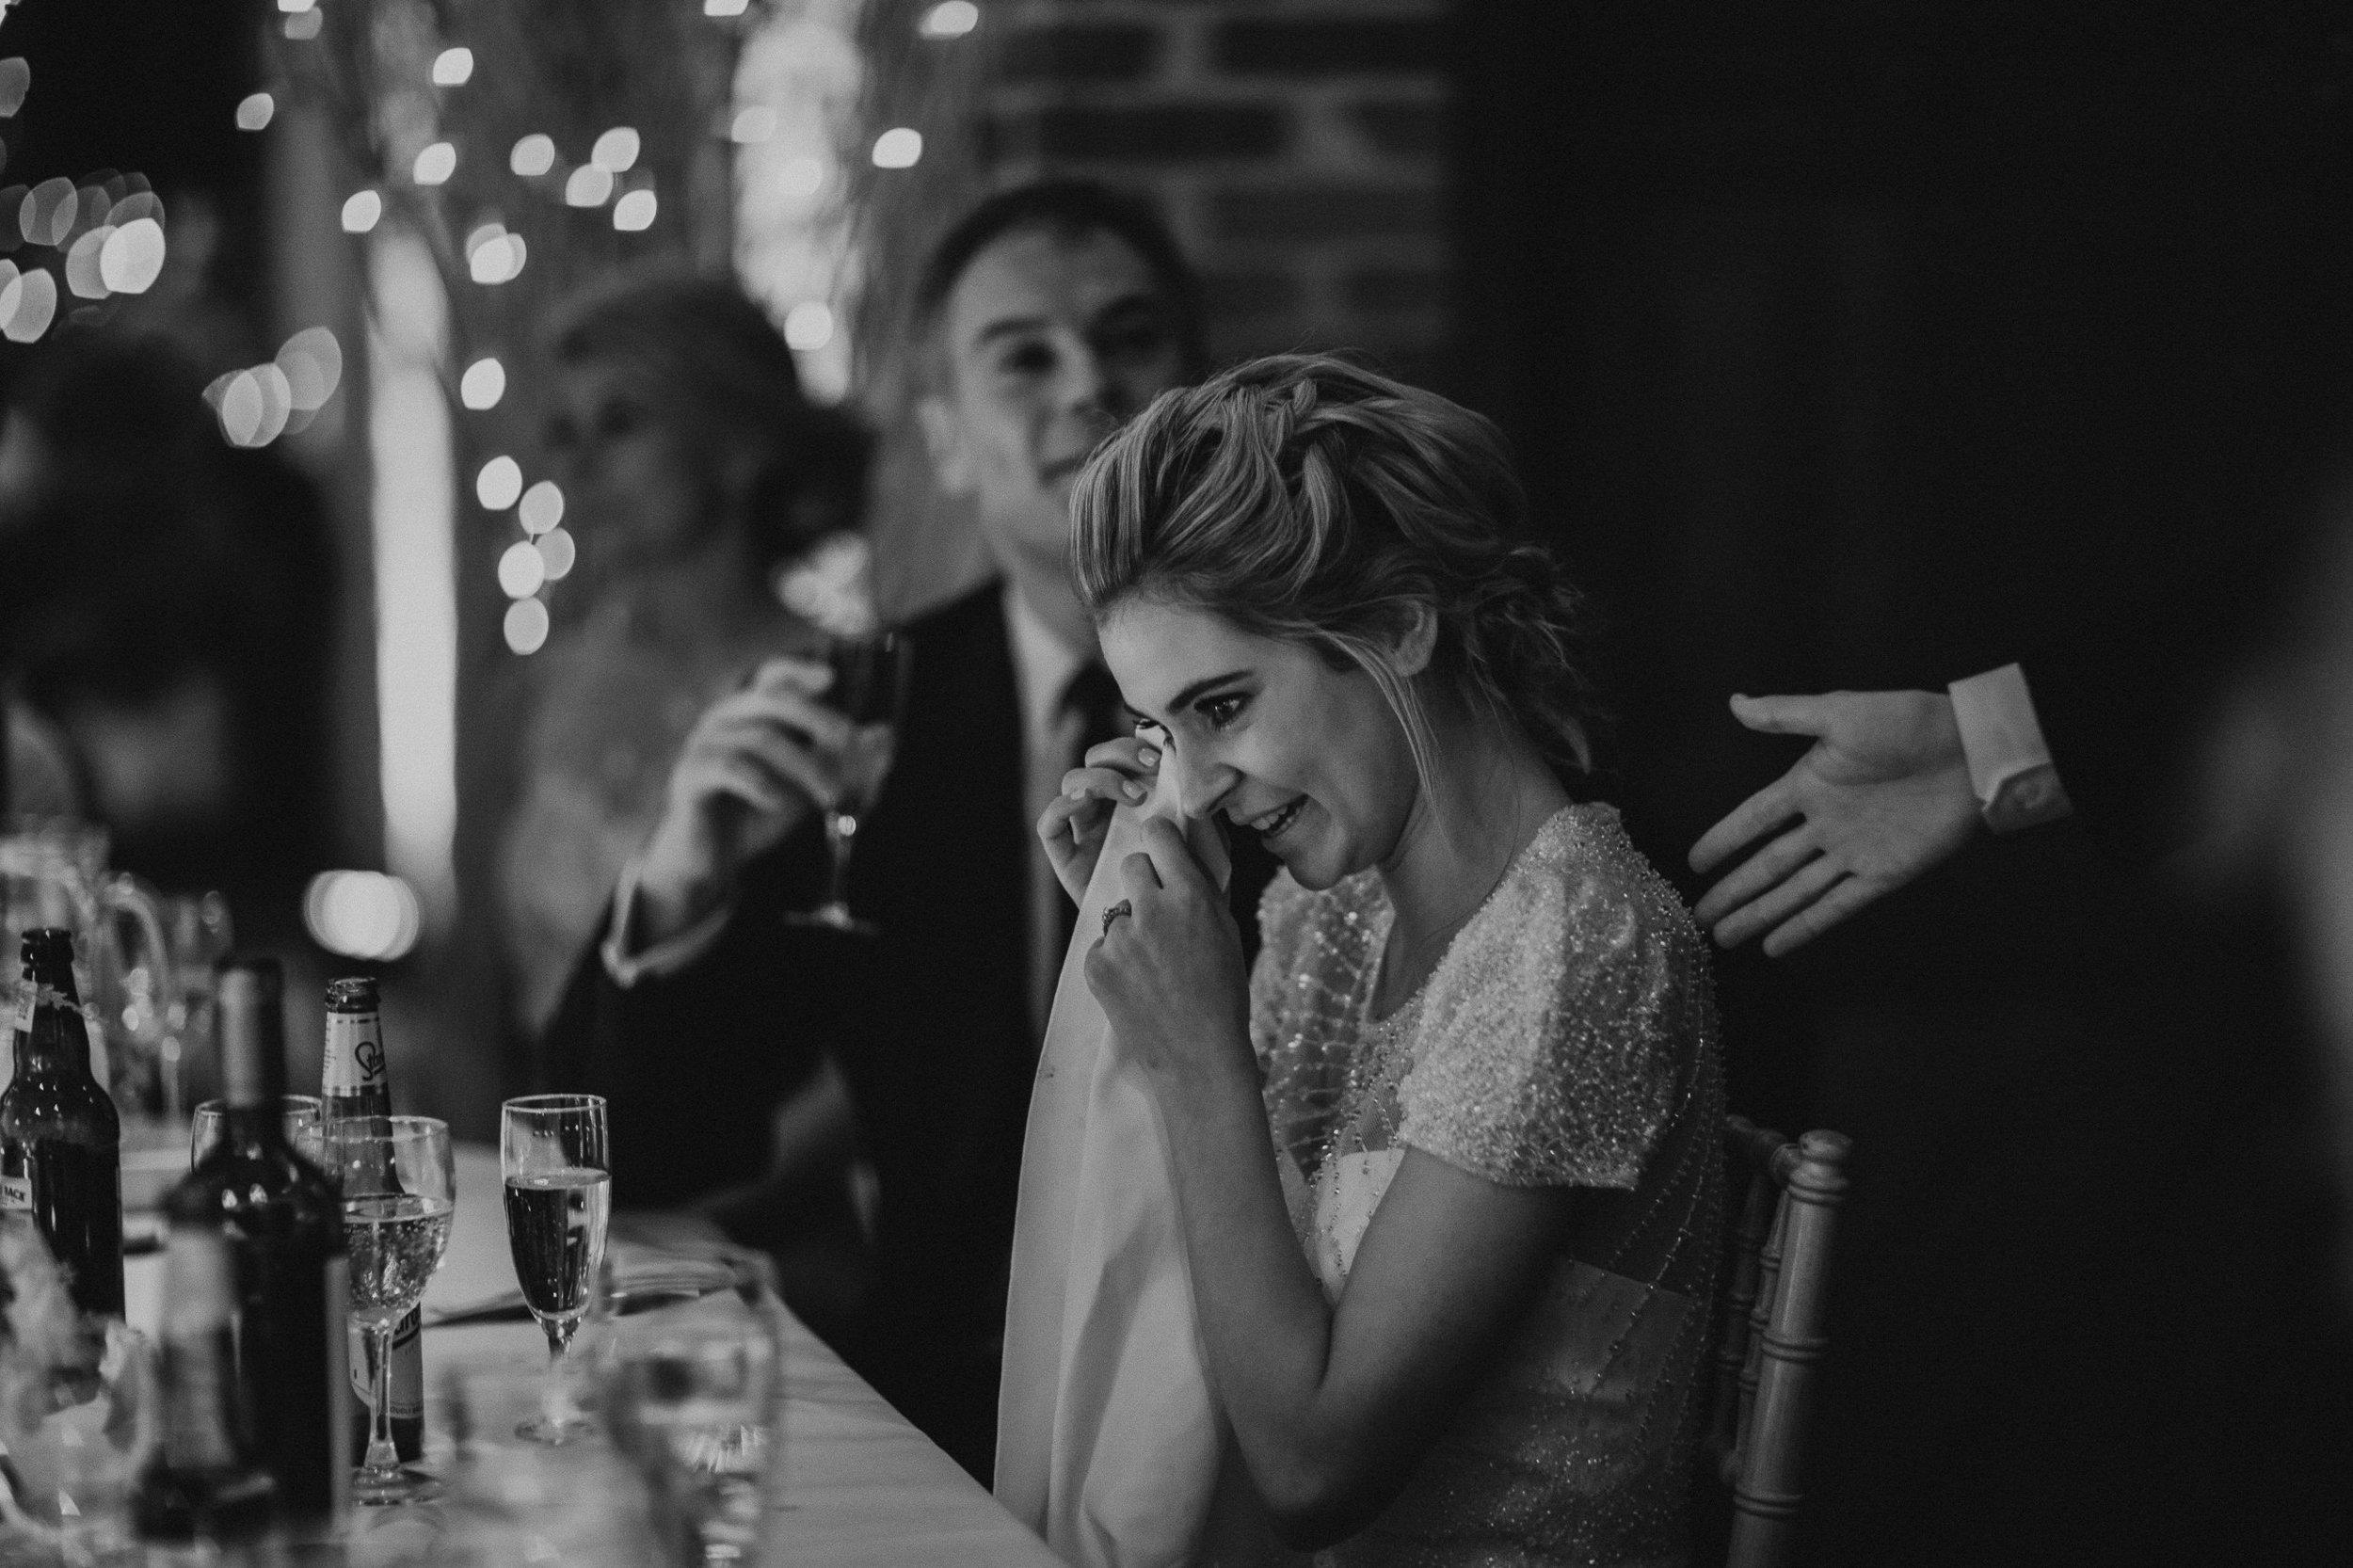 Jenny Packham dress Bury Court Barn Hampshire Wedding Photographer Gione da Silva_024.jpg